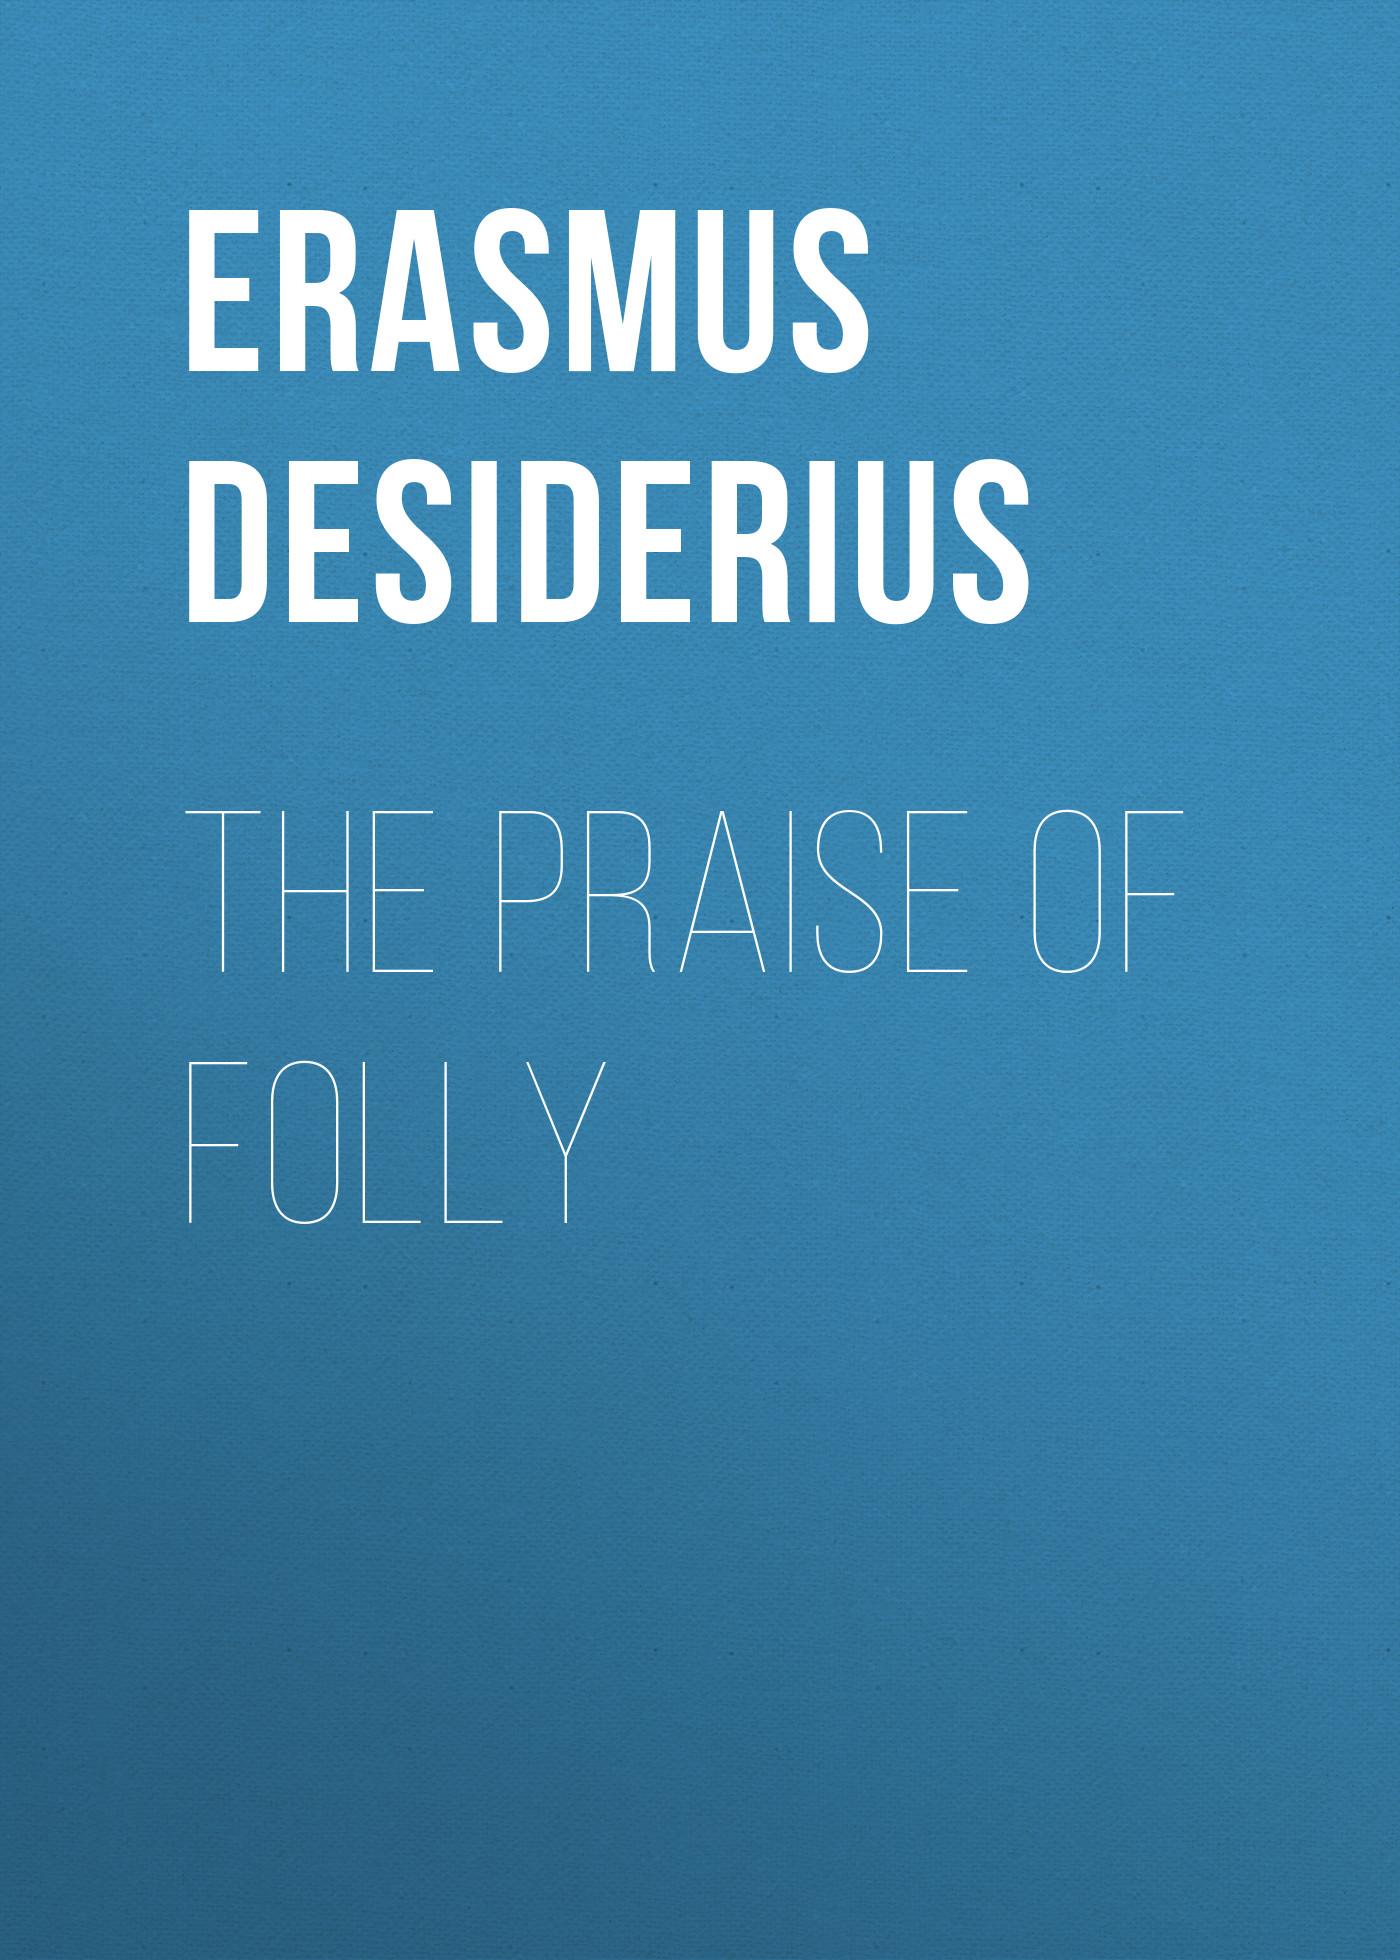 Erasmus Desiderius The Praise of Folly erasmus desiderius elogio della pazzia italian edition